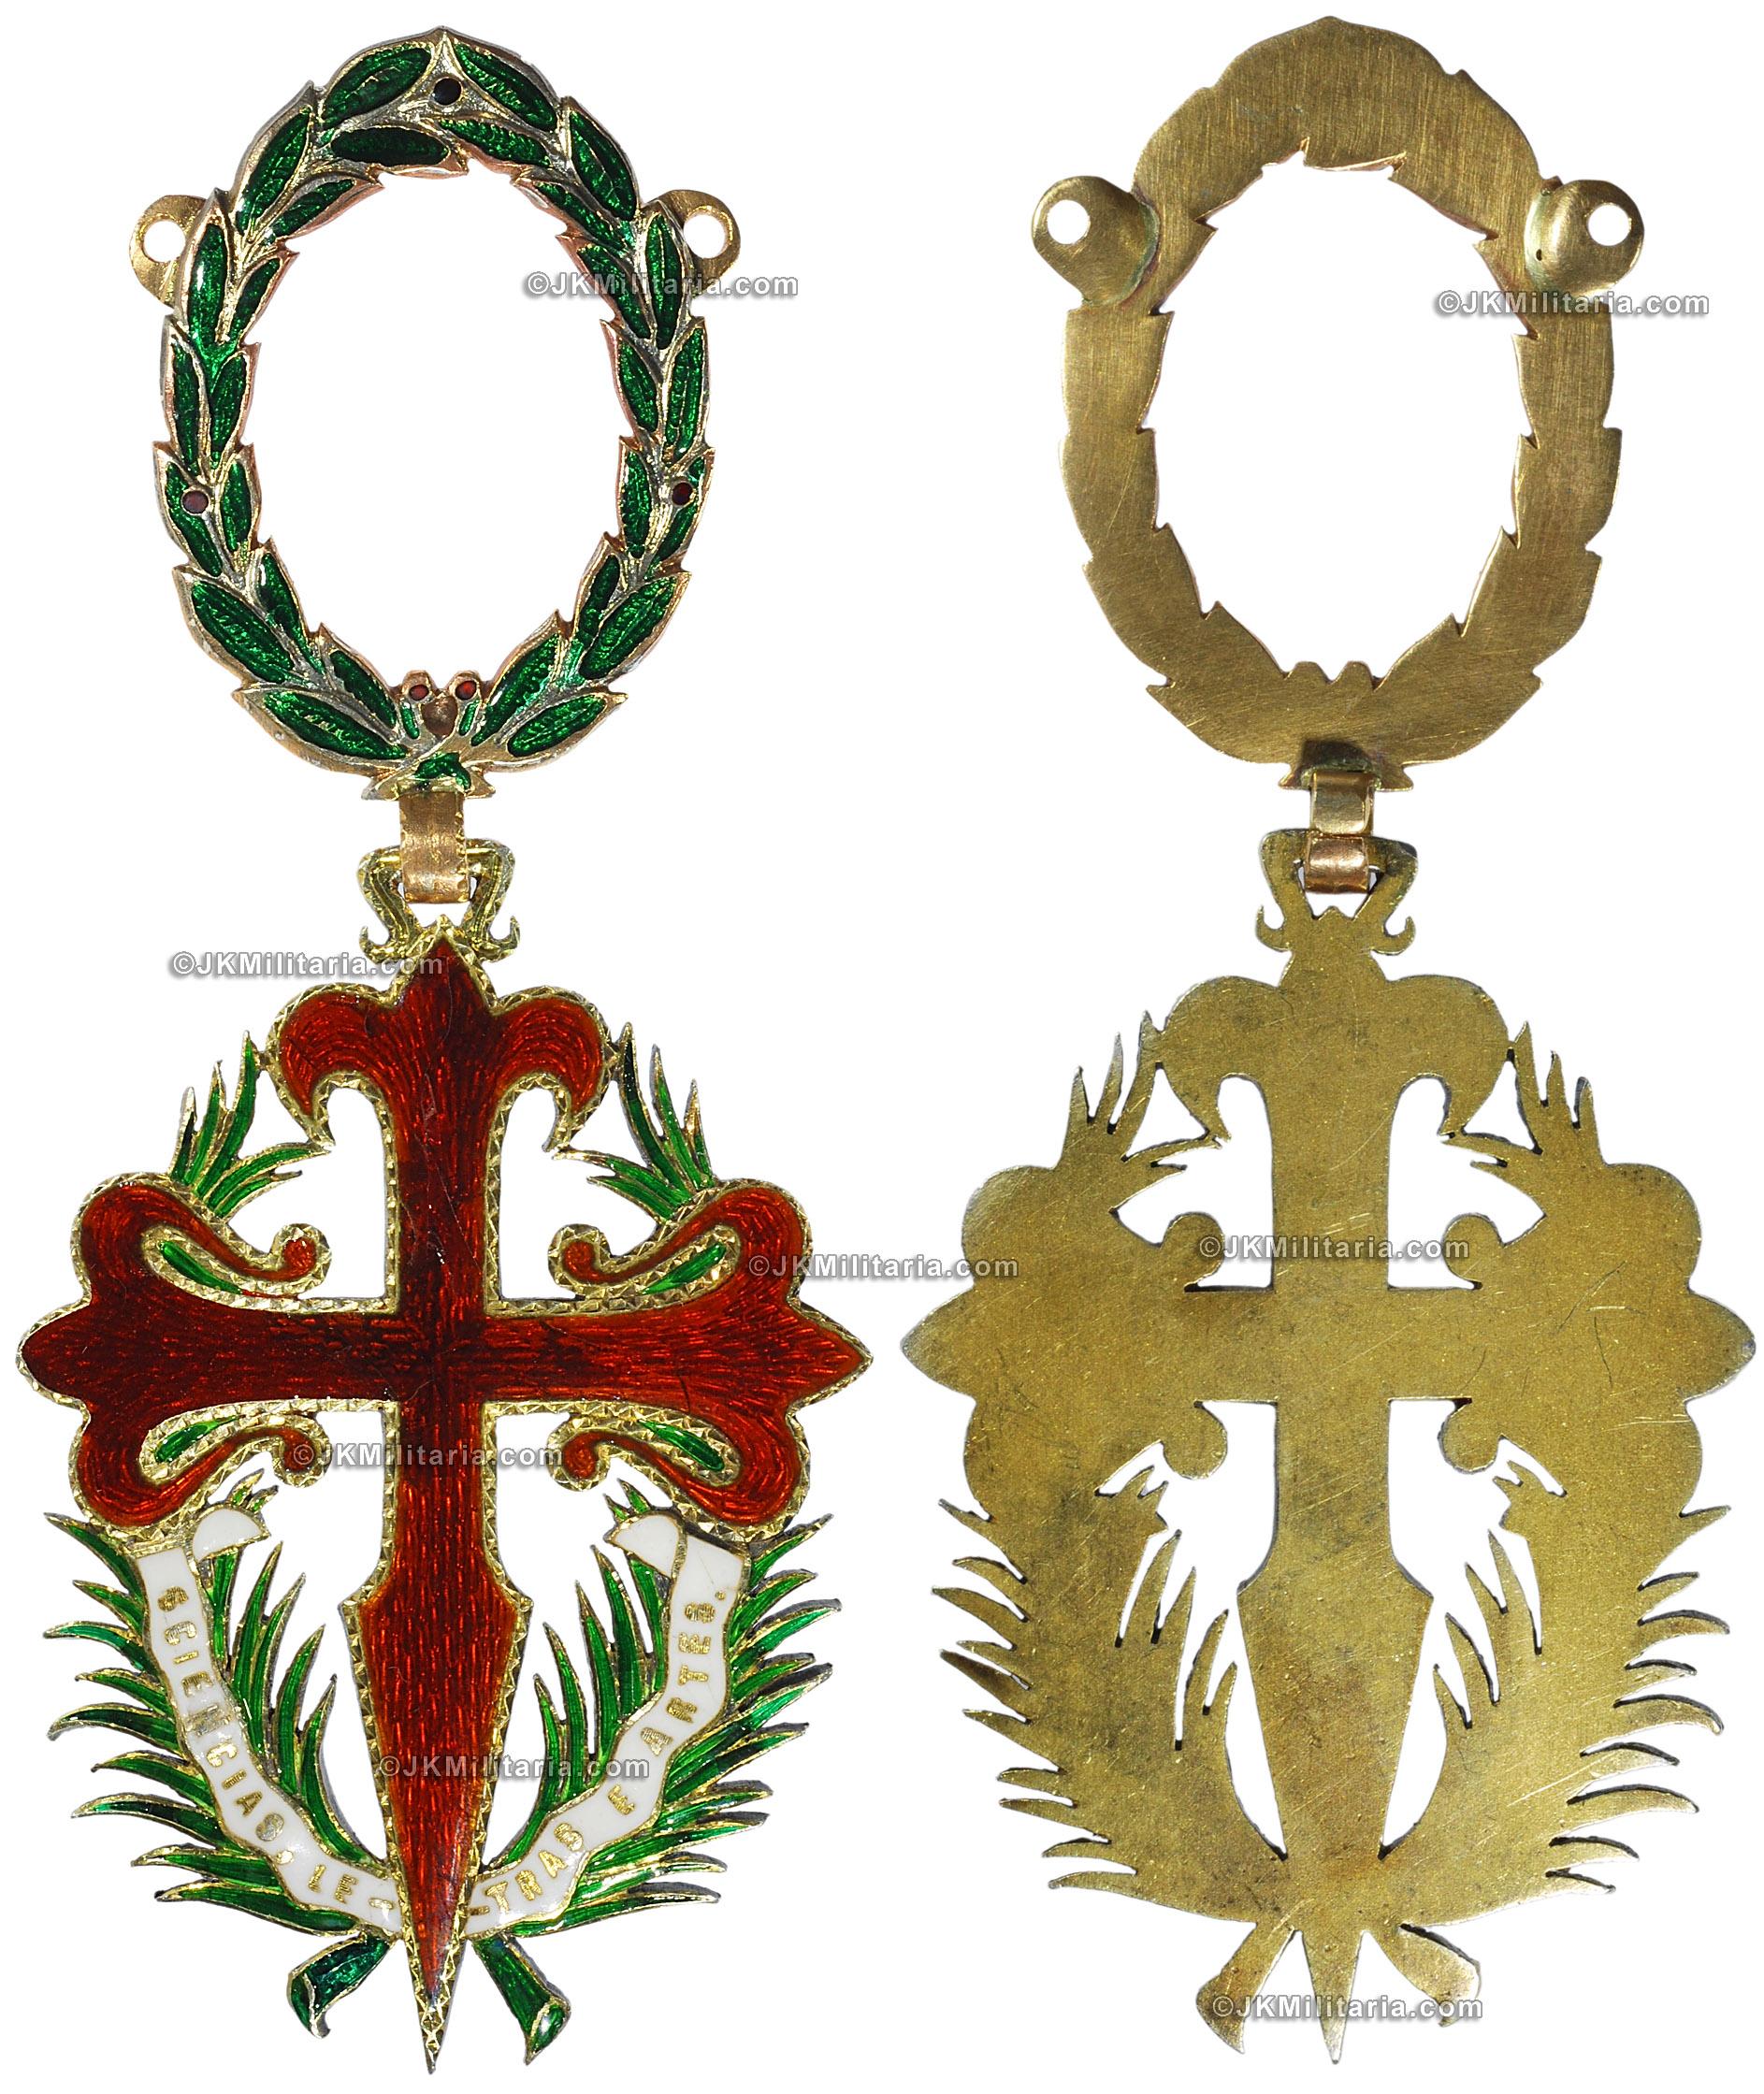 jk militaria offering portugese militaria orders medals and badges